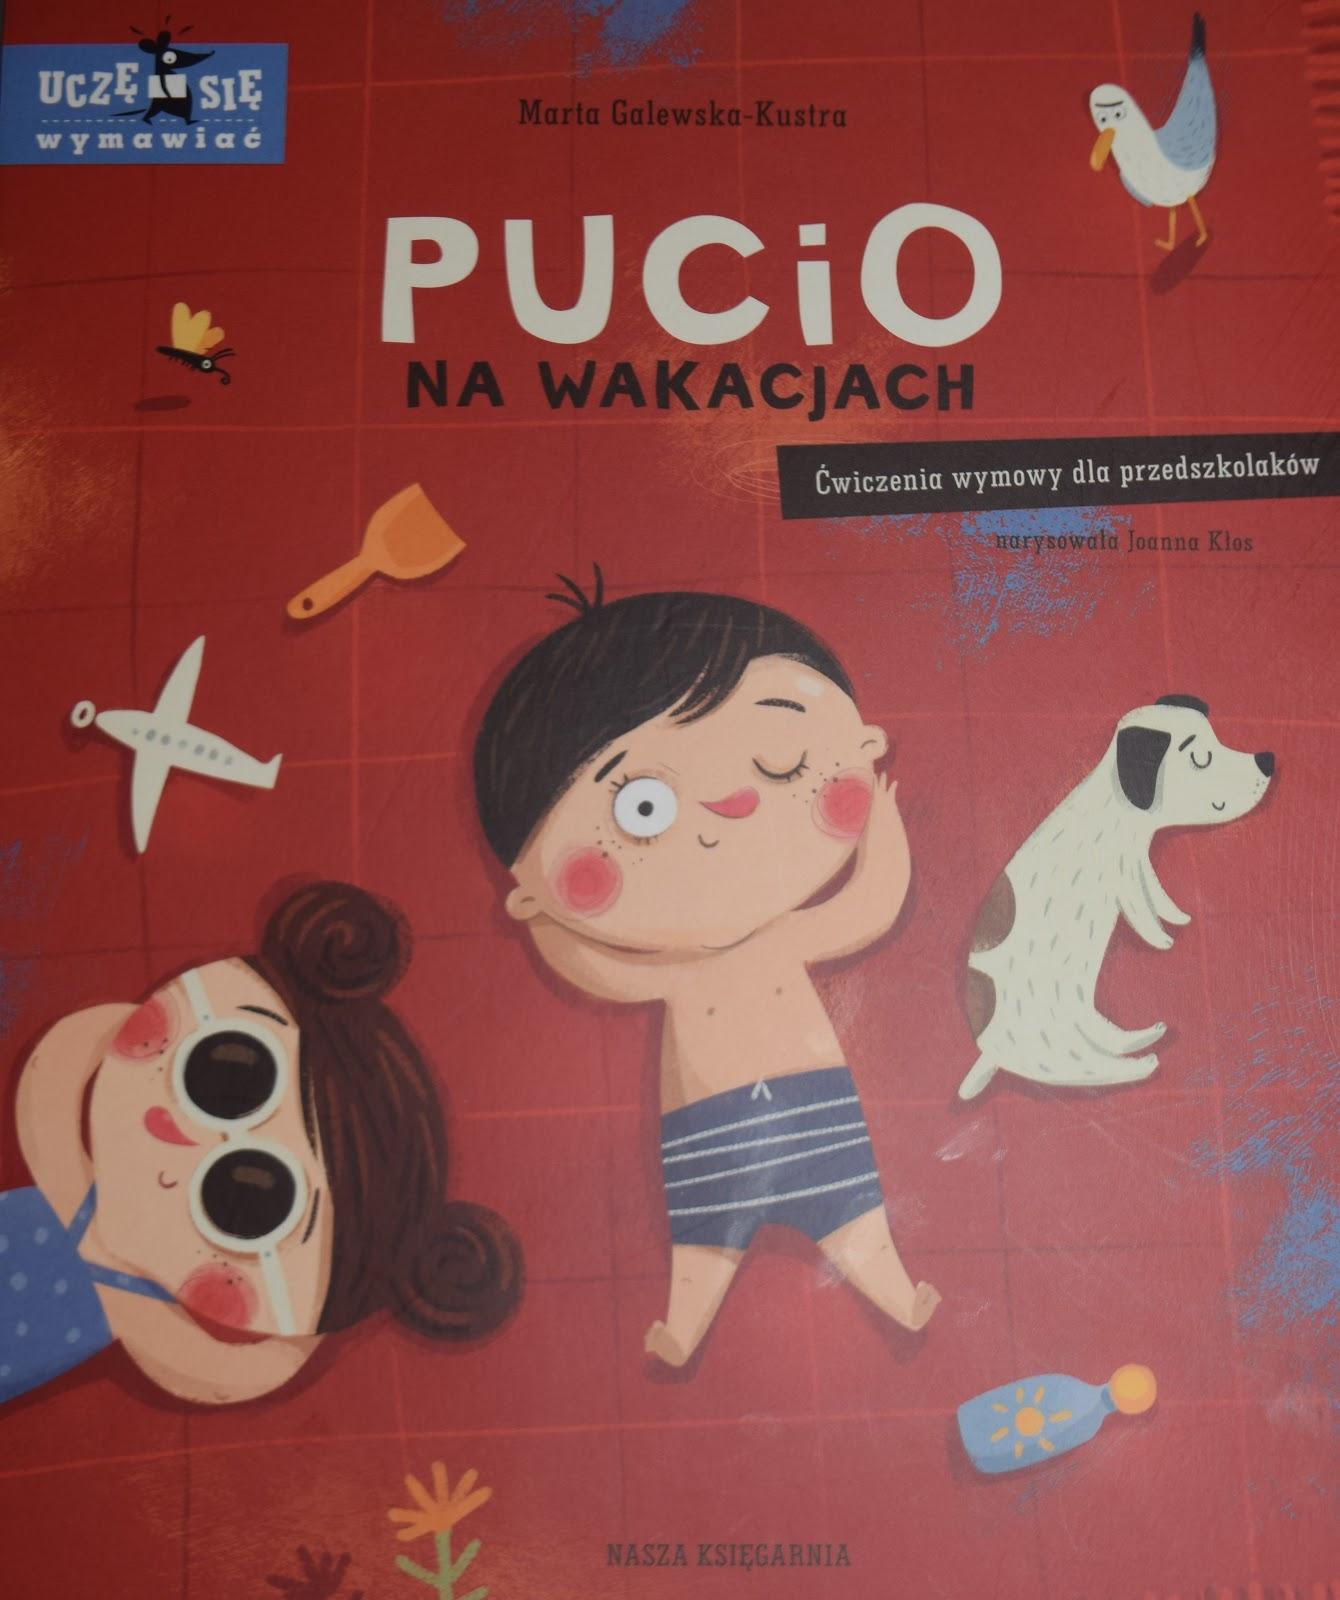 Pucio na wakacjach - Wydawnictwo NASZA KSIĘGARNIA